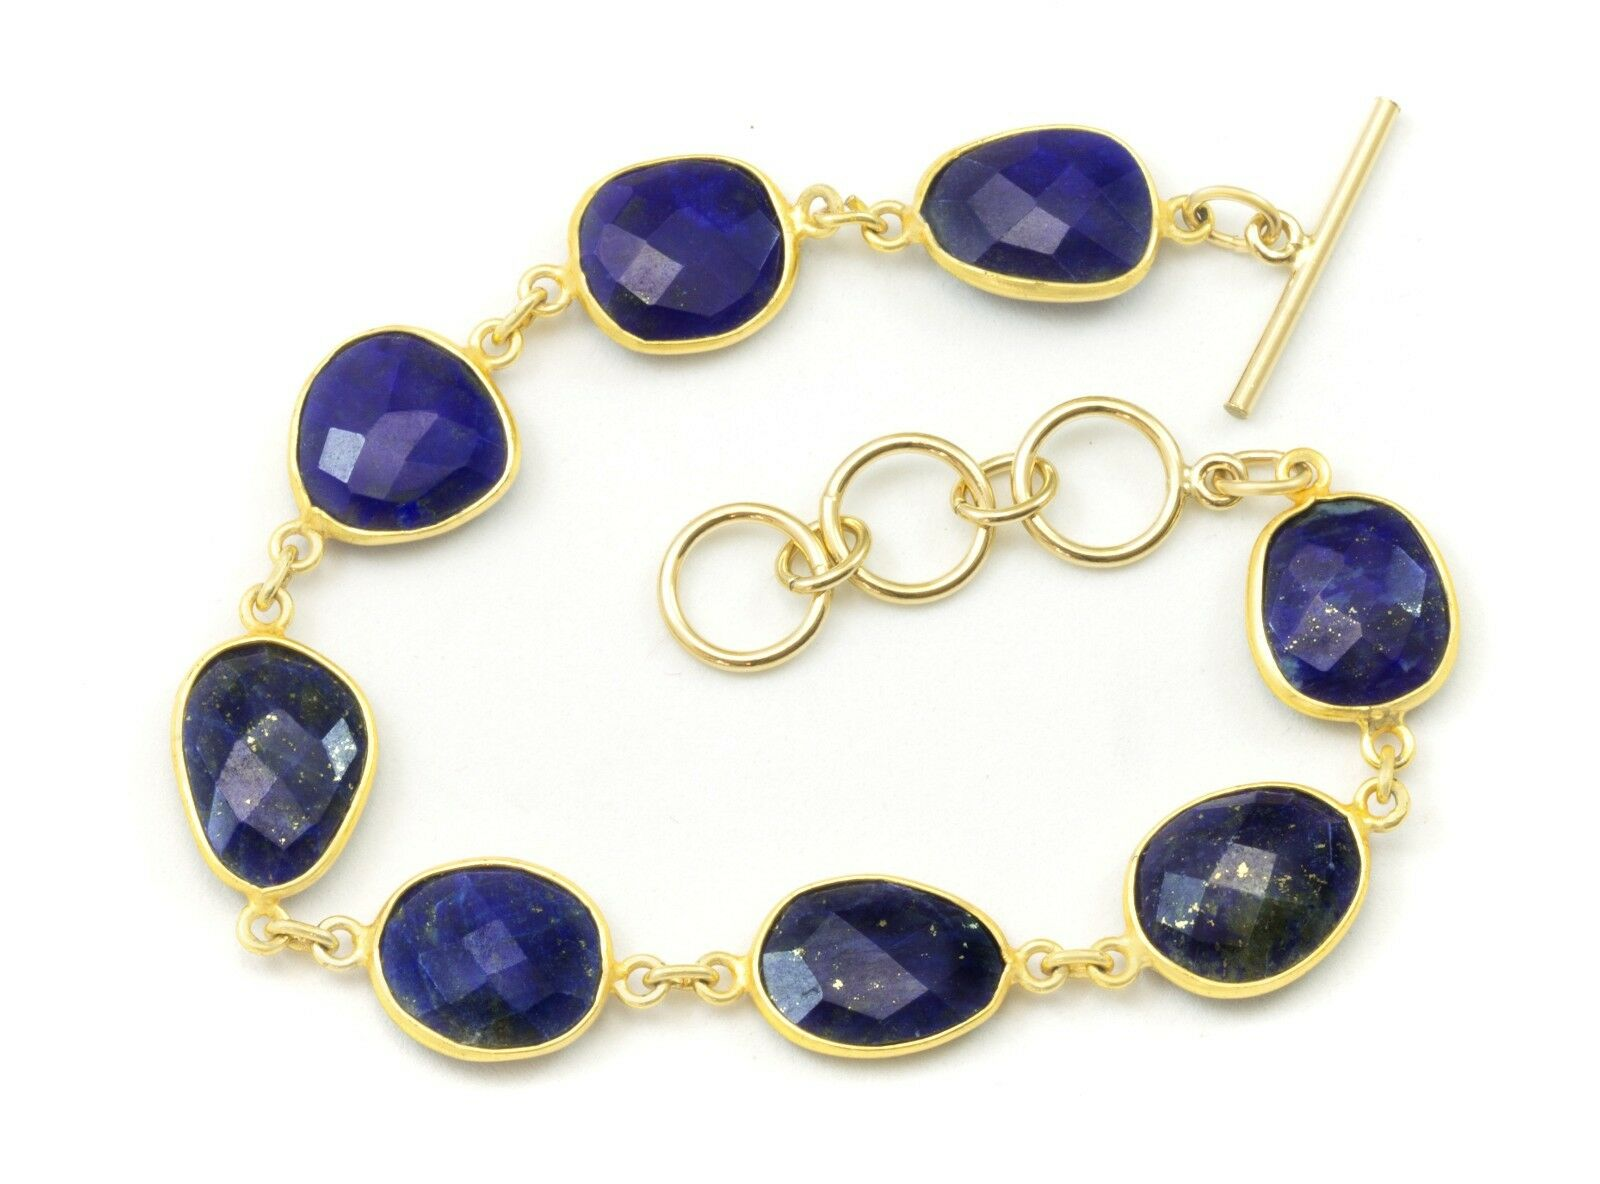 bluee Lapis Lbluei Bracelet Large Bezel Faceted 7 8 Inch Adjustable 14k gold Fill